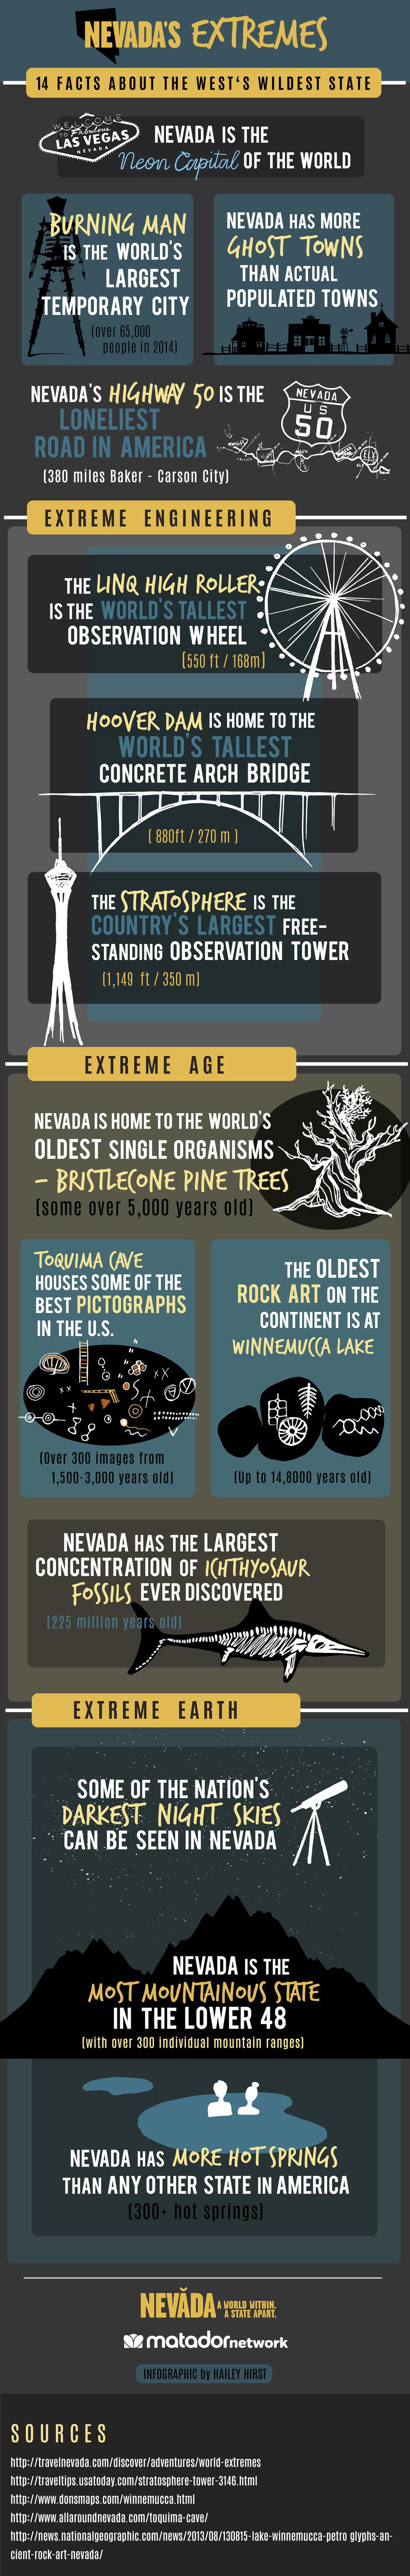 Nevada's Extremes